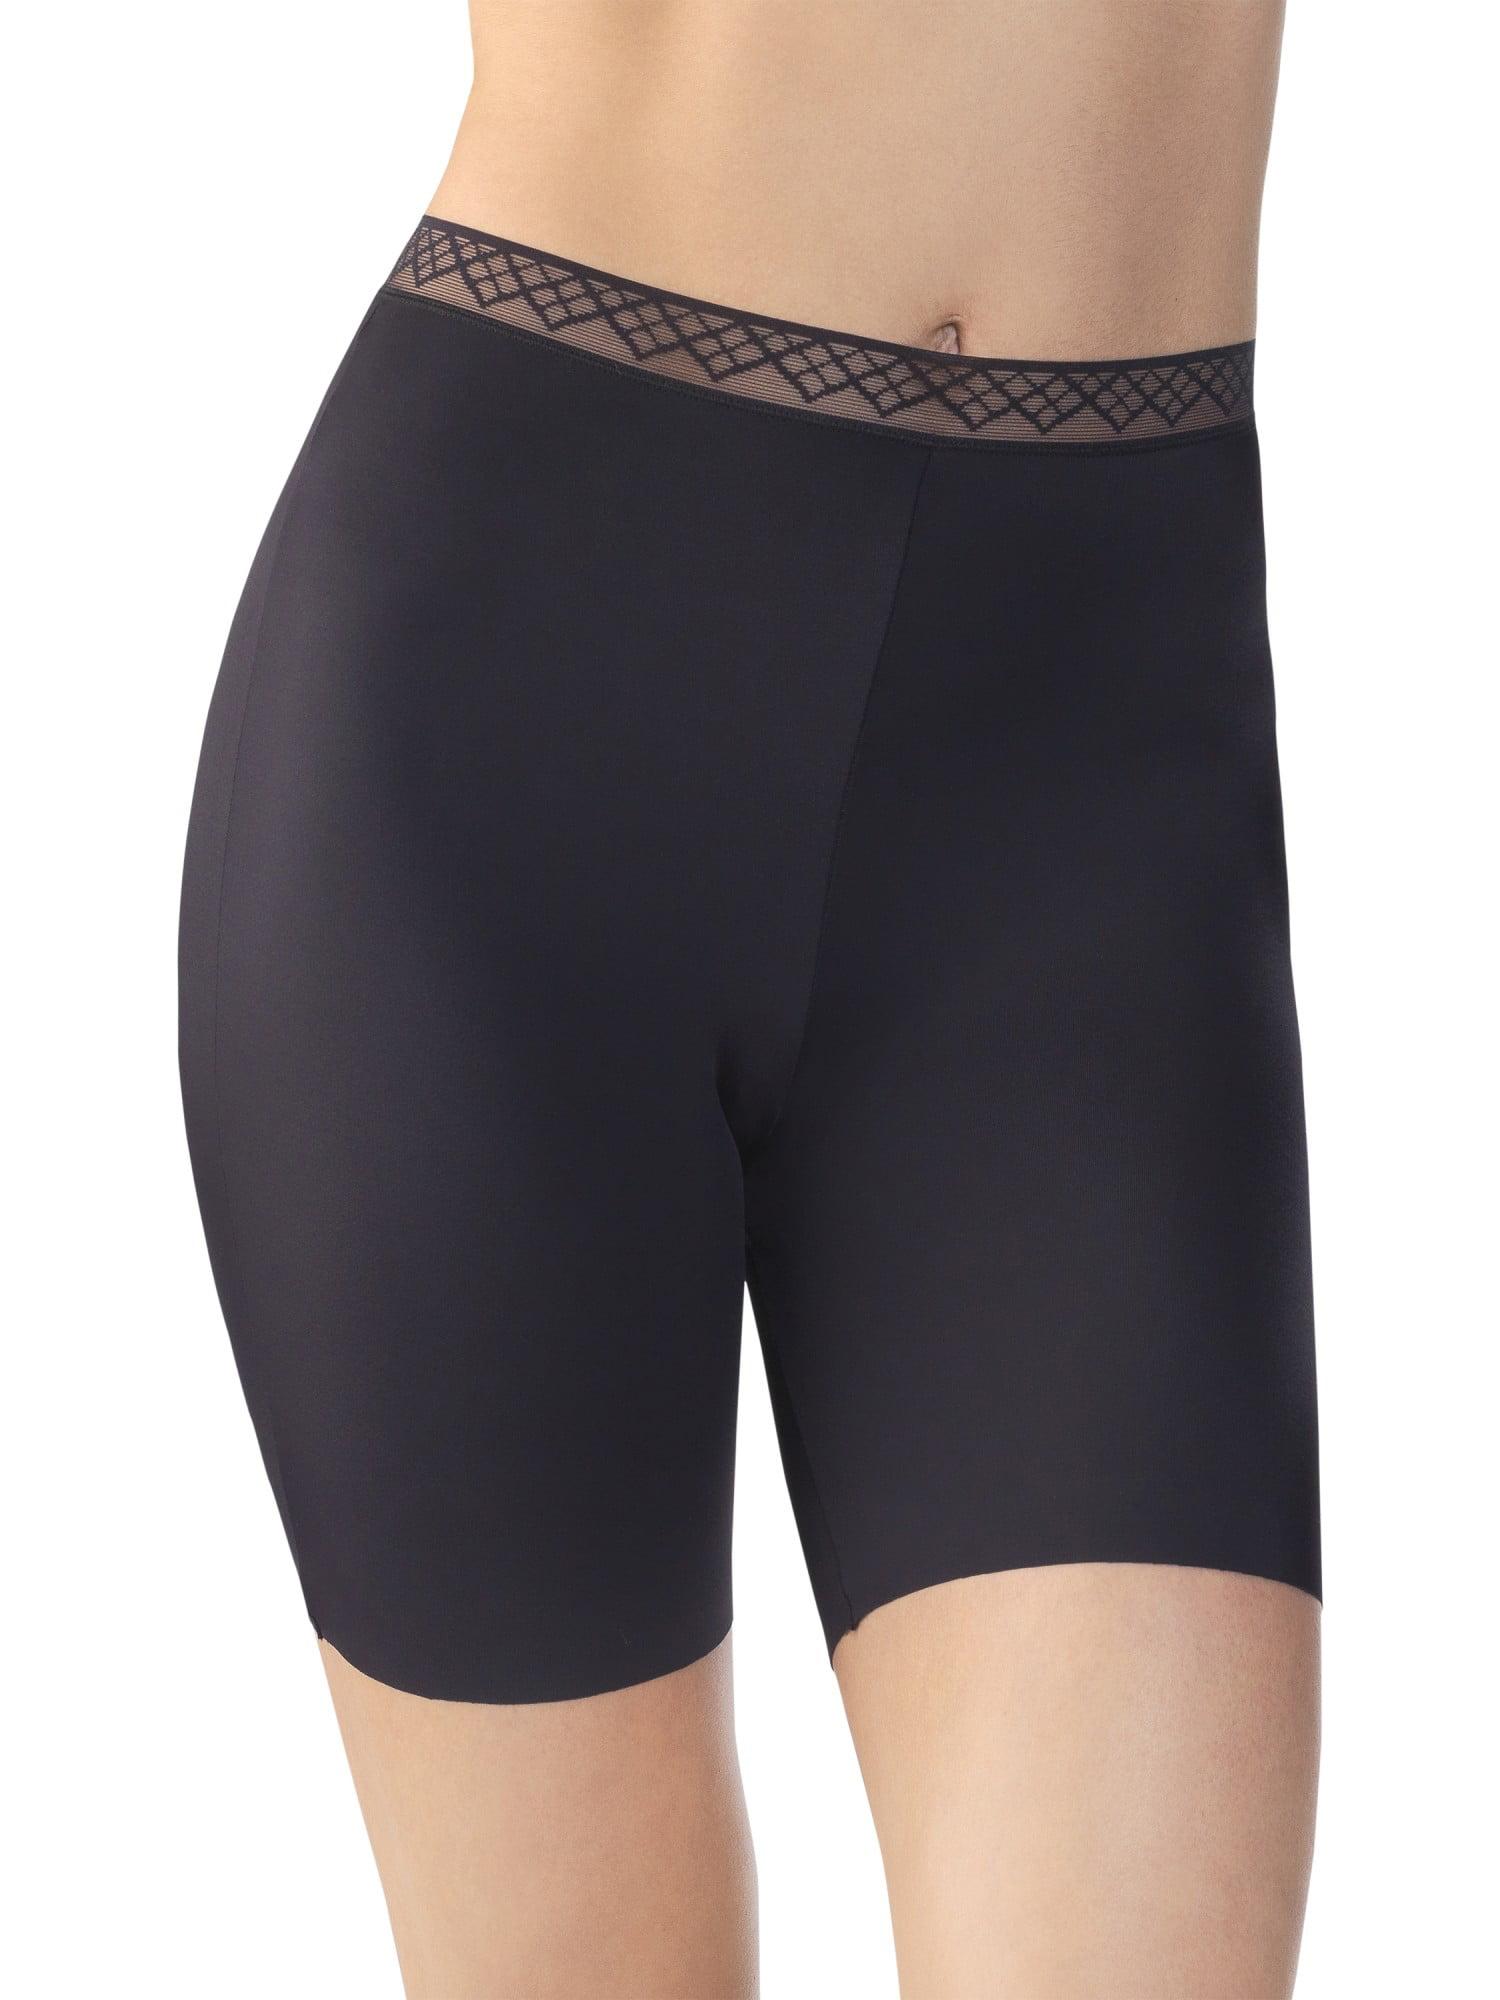 cbea6dbf749 Vassarette - Women s Invisibly Smooth Slip Short